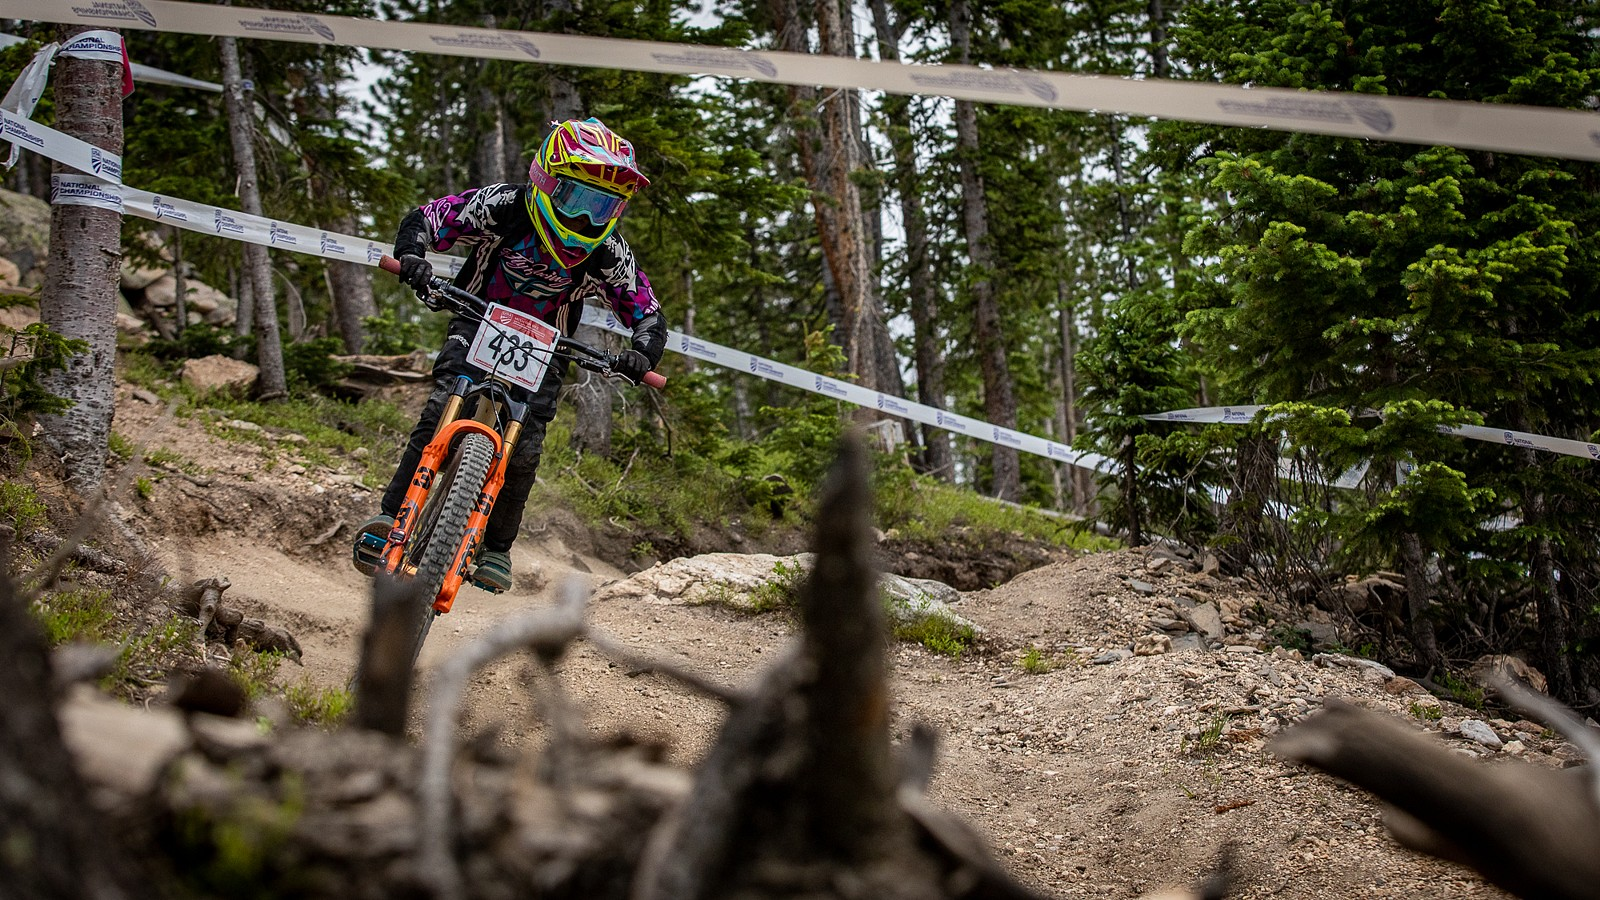 Sophie Gregory, Women's Jr 11-12 Champ - US National Champs Downhill Photo Blast - Mountain Biking Pictures - Vital MTB